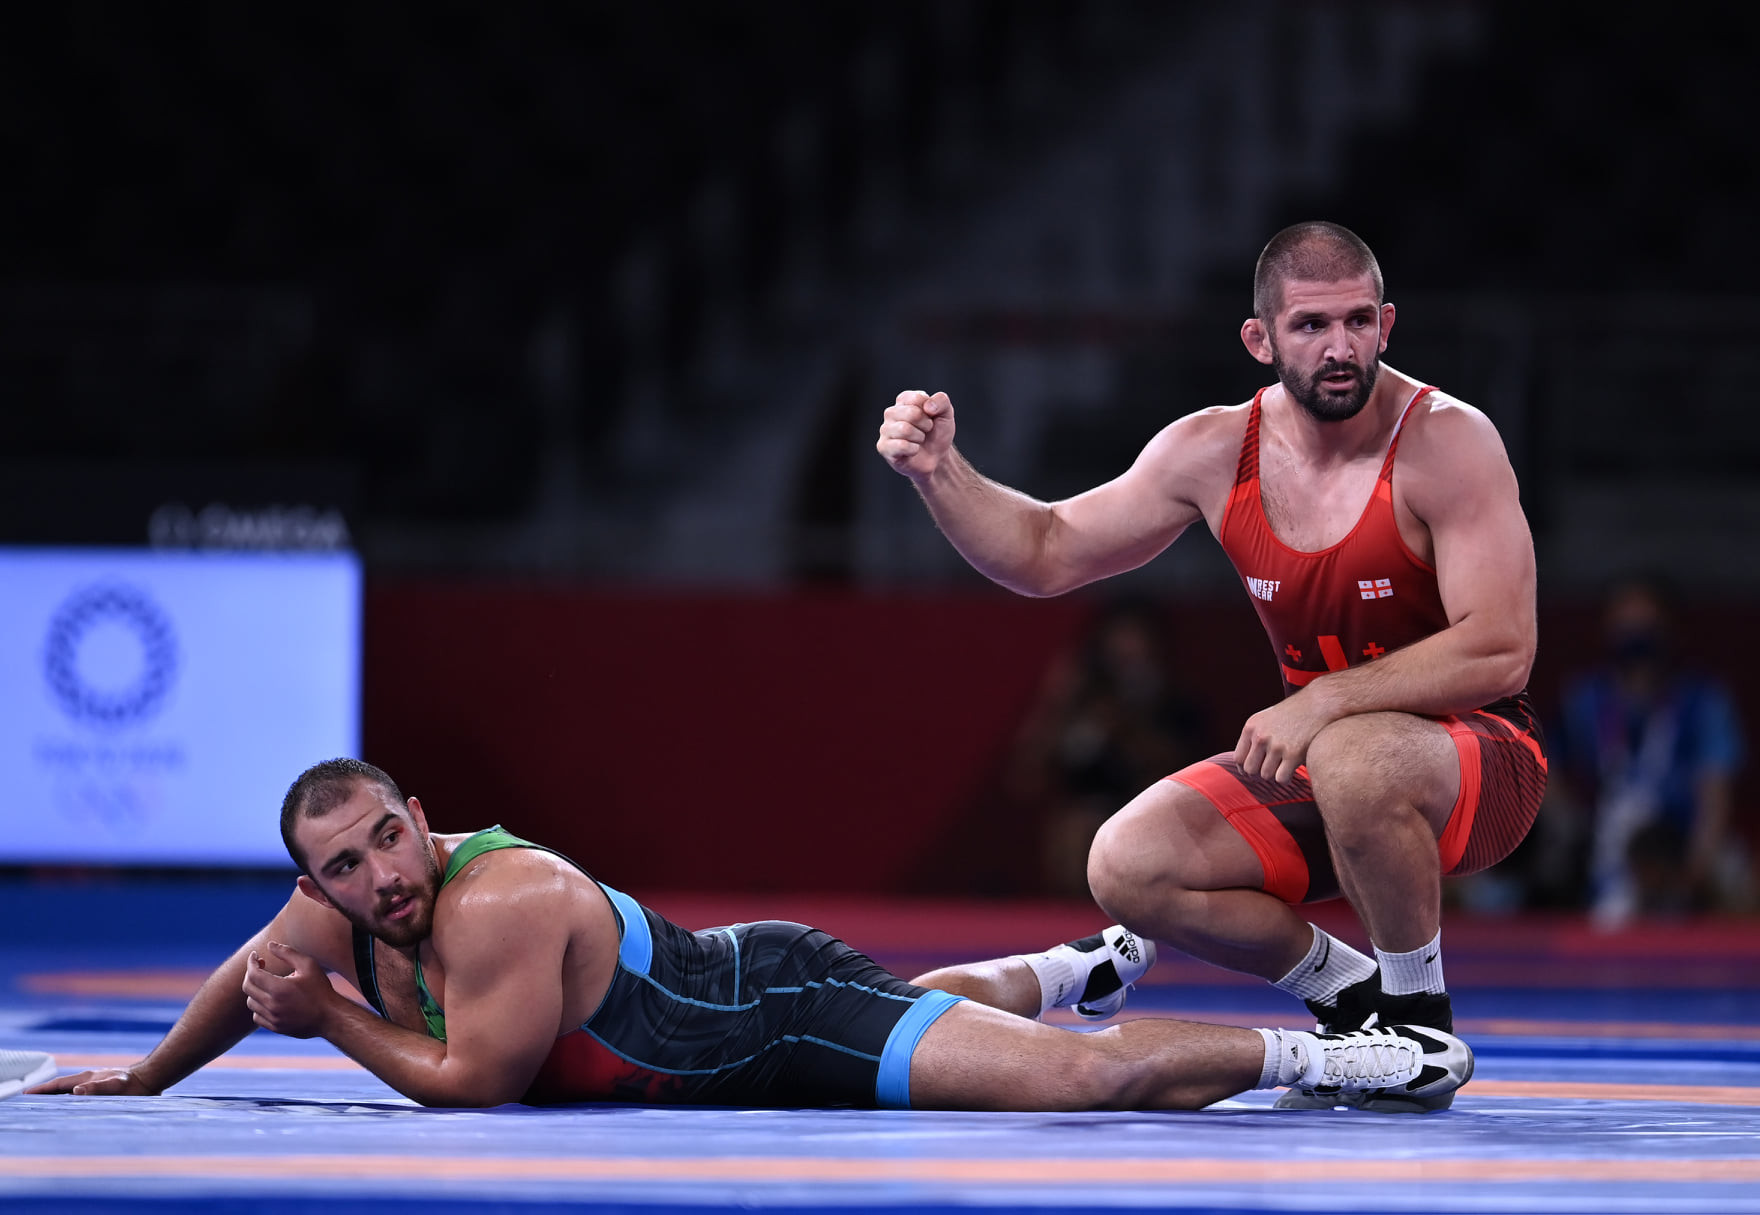 Geno Petriashvili 32 спорт спорт